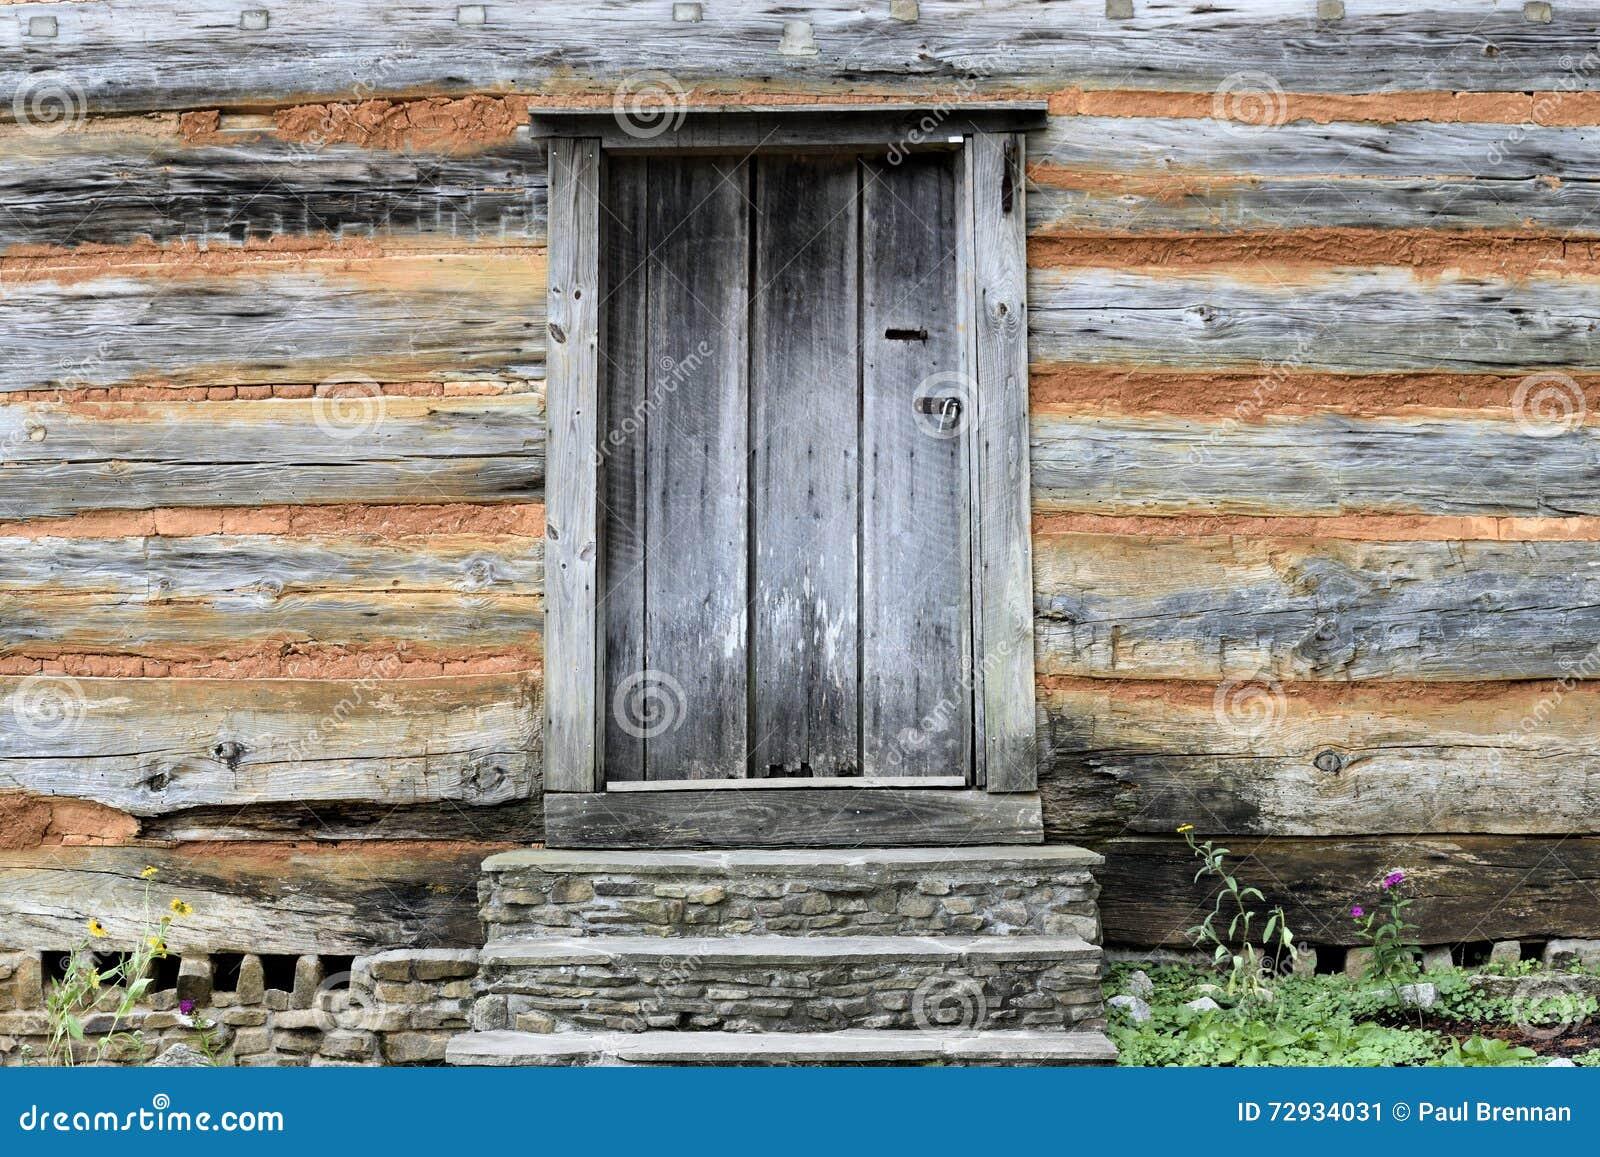 Door in wood and brick log cabin stock image image 72934031 for Brick cabin